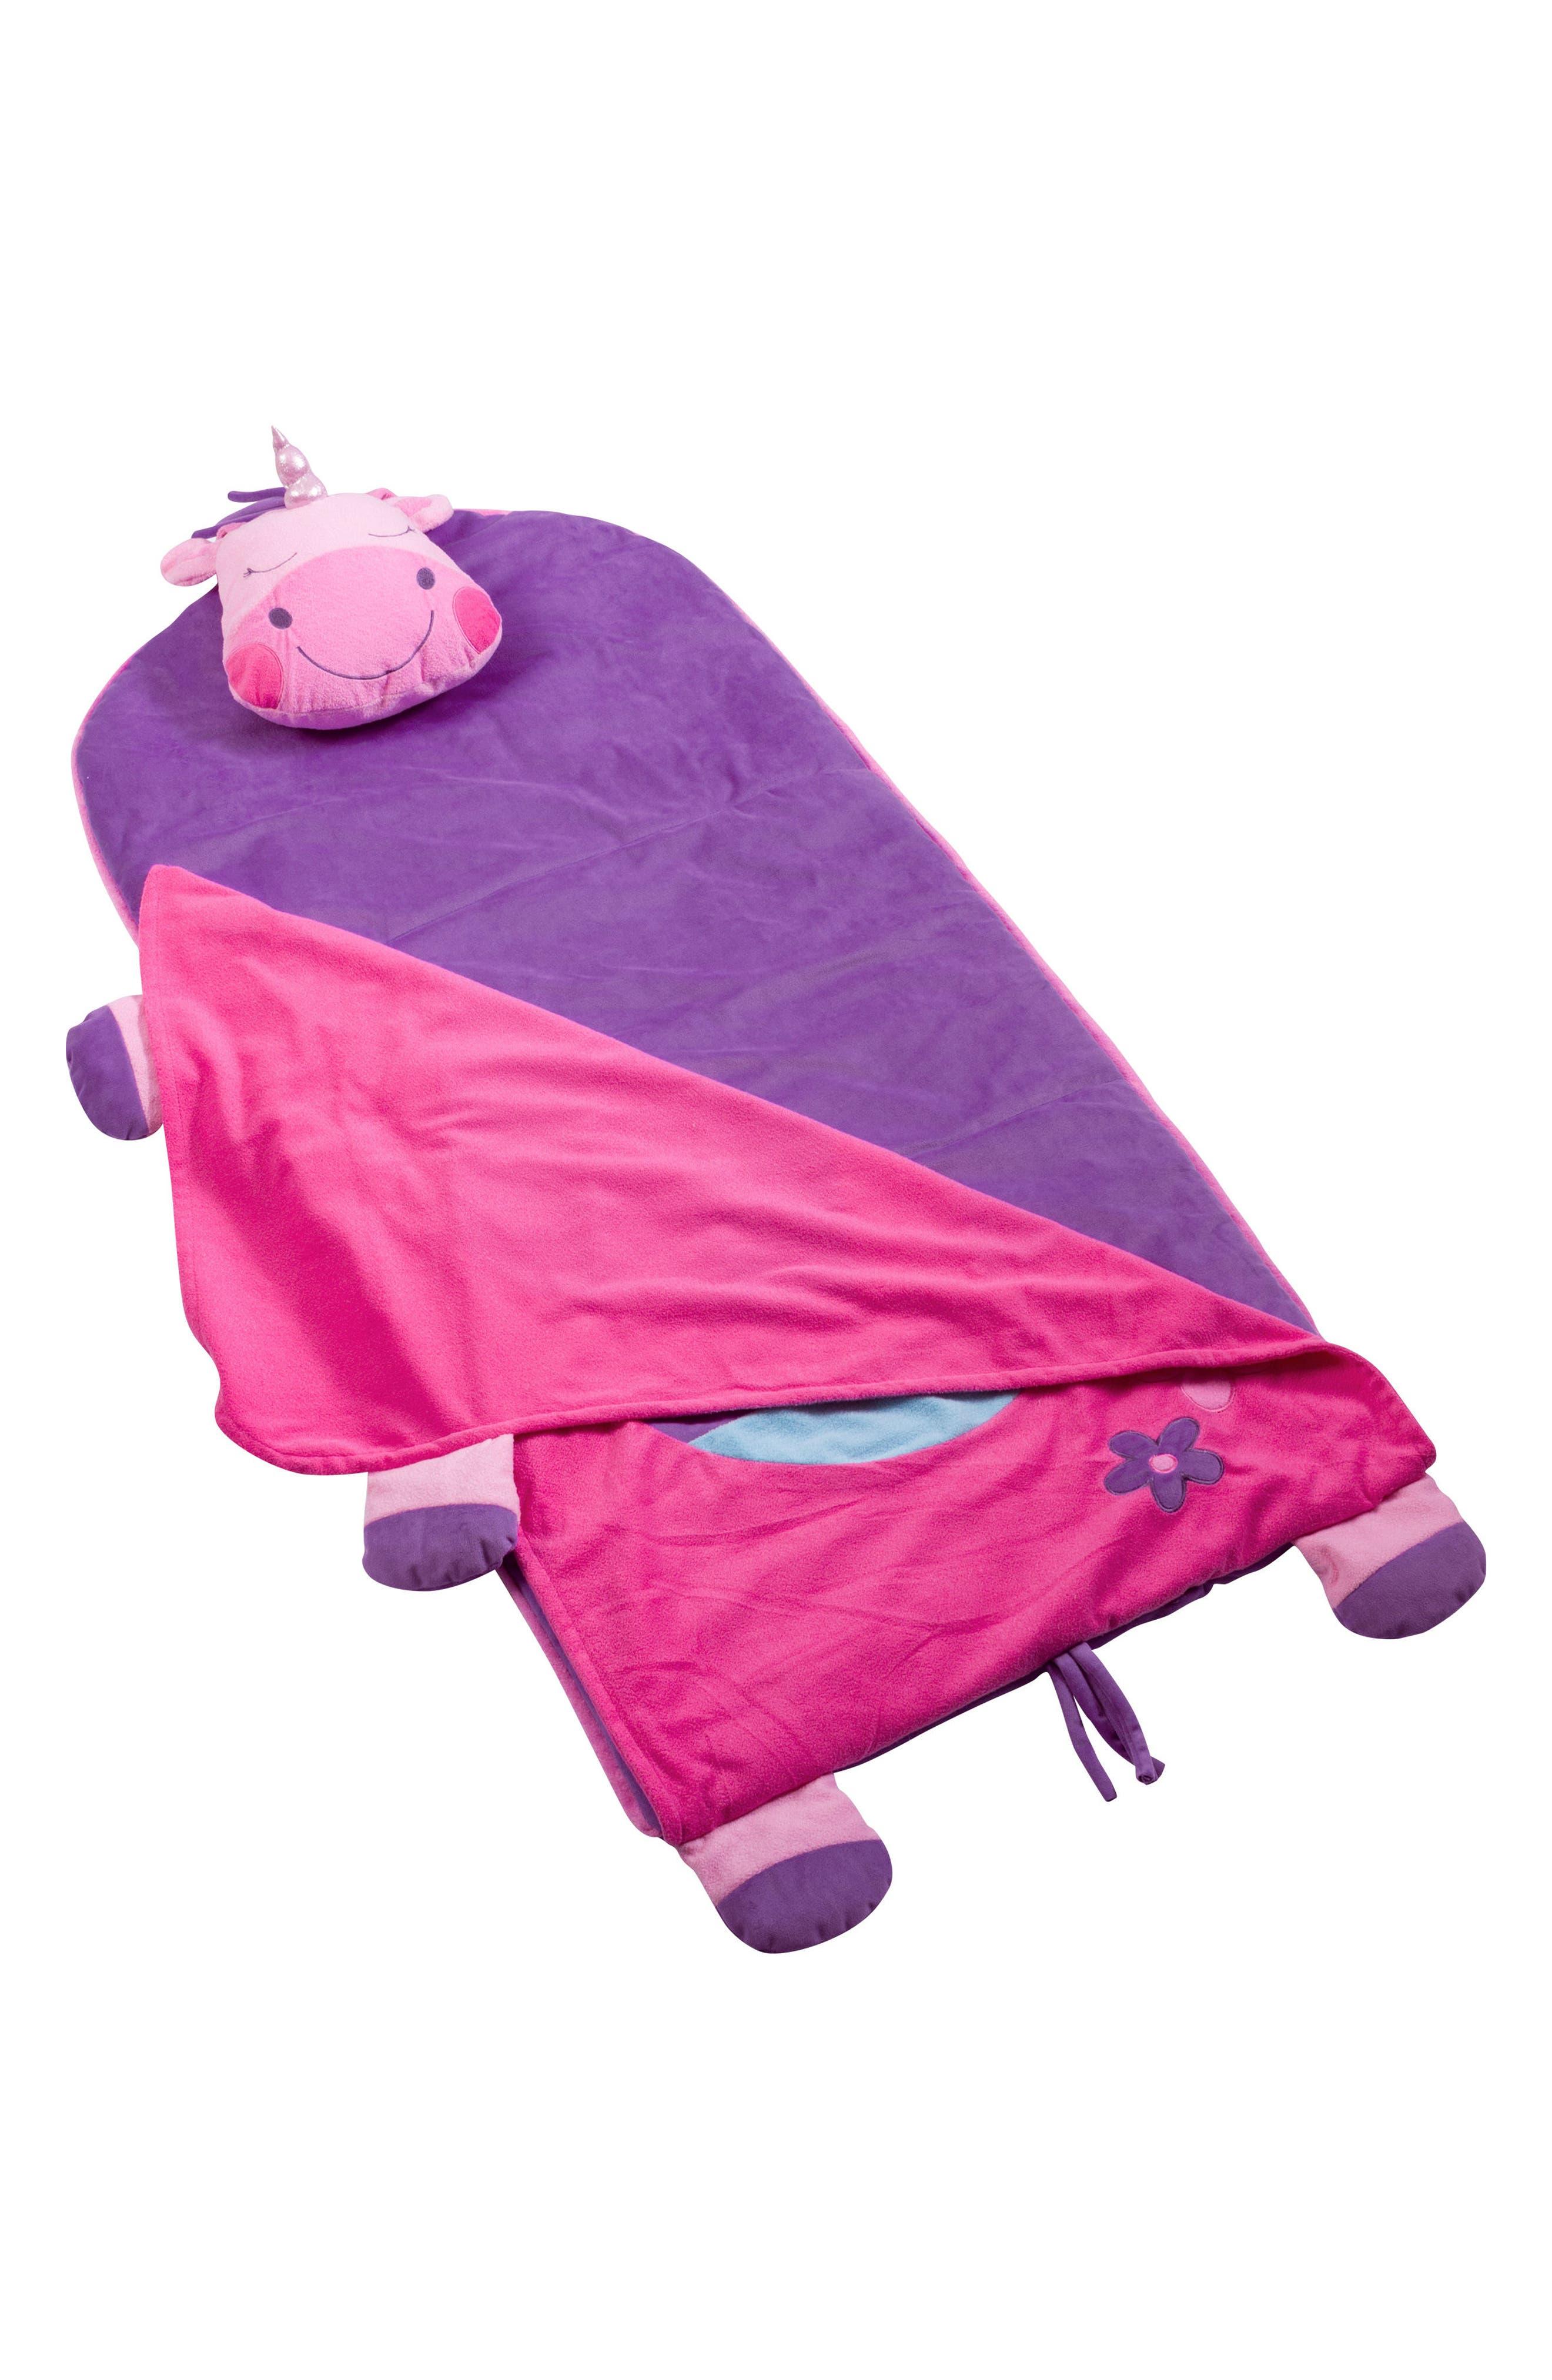 Portable Nap Mat, Pillow & Blanket,                             Alternate thumbnail 2, color,                             UNICORN